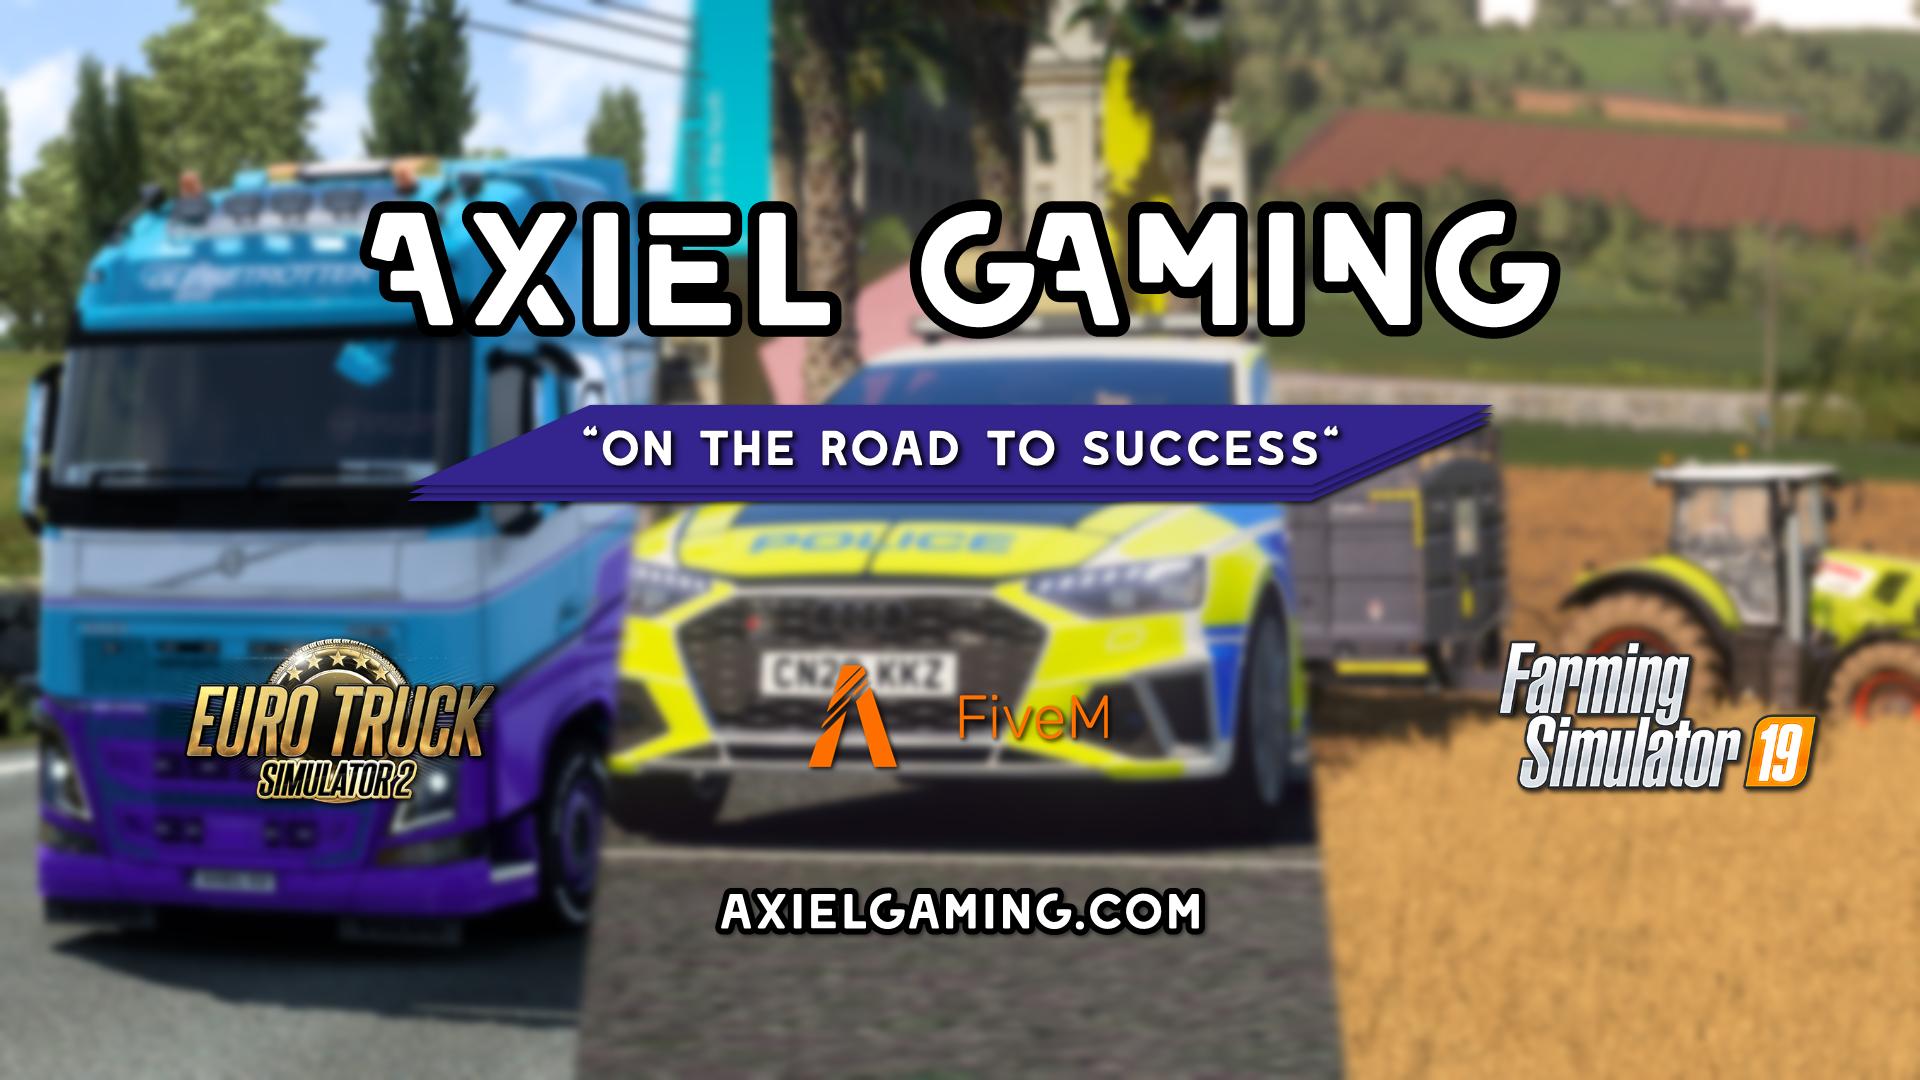 Axiel Gaming Community